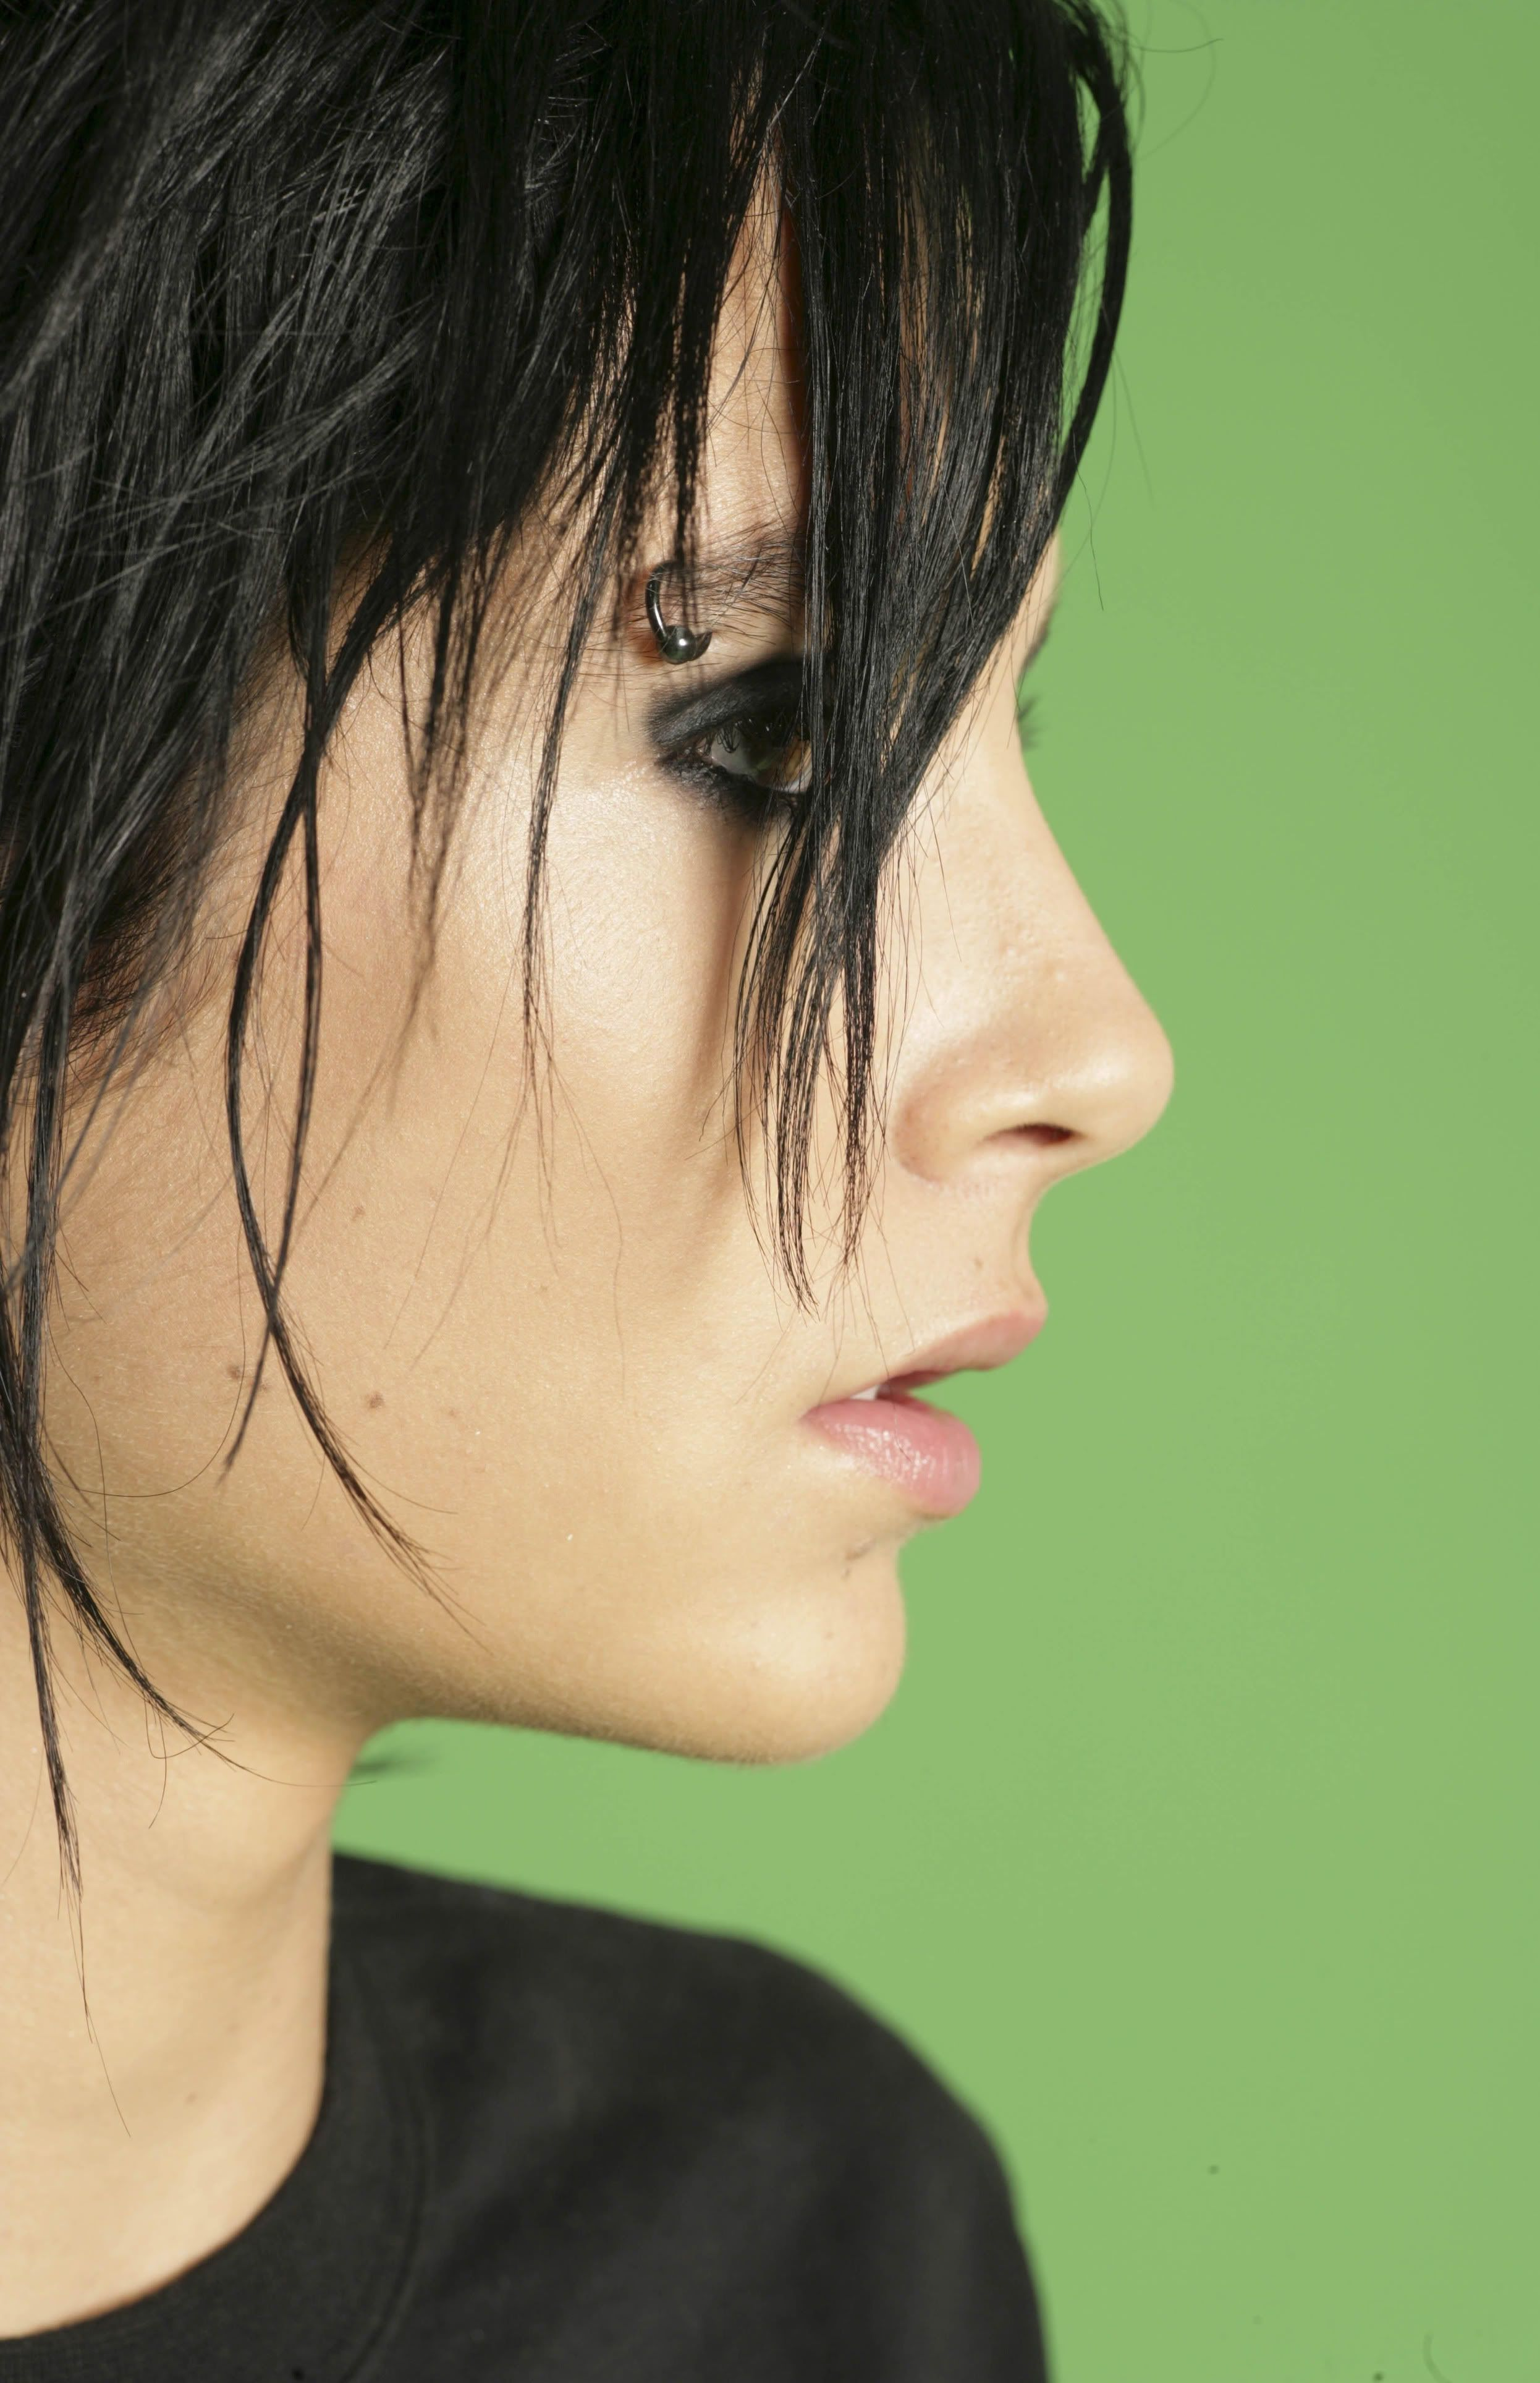 Bill 2006 Kaulitz Tokio Hotel Tom